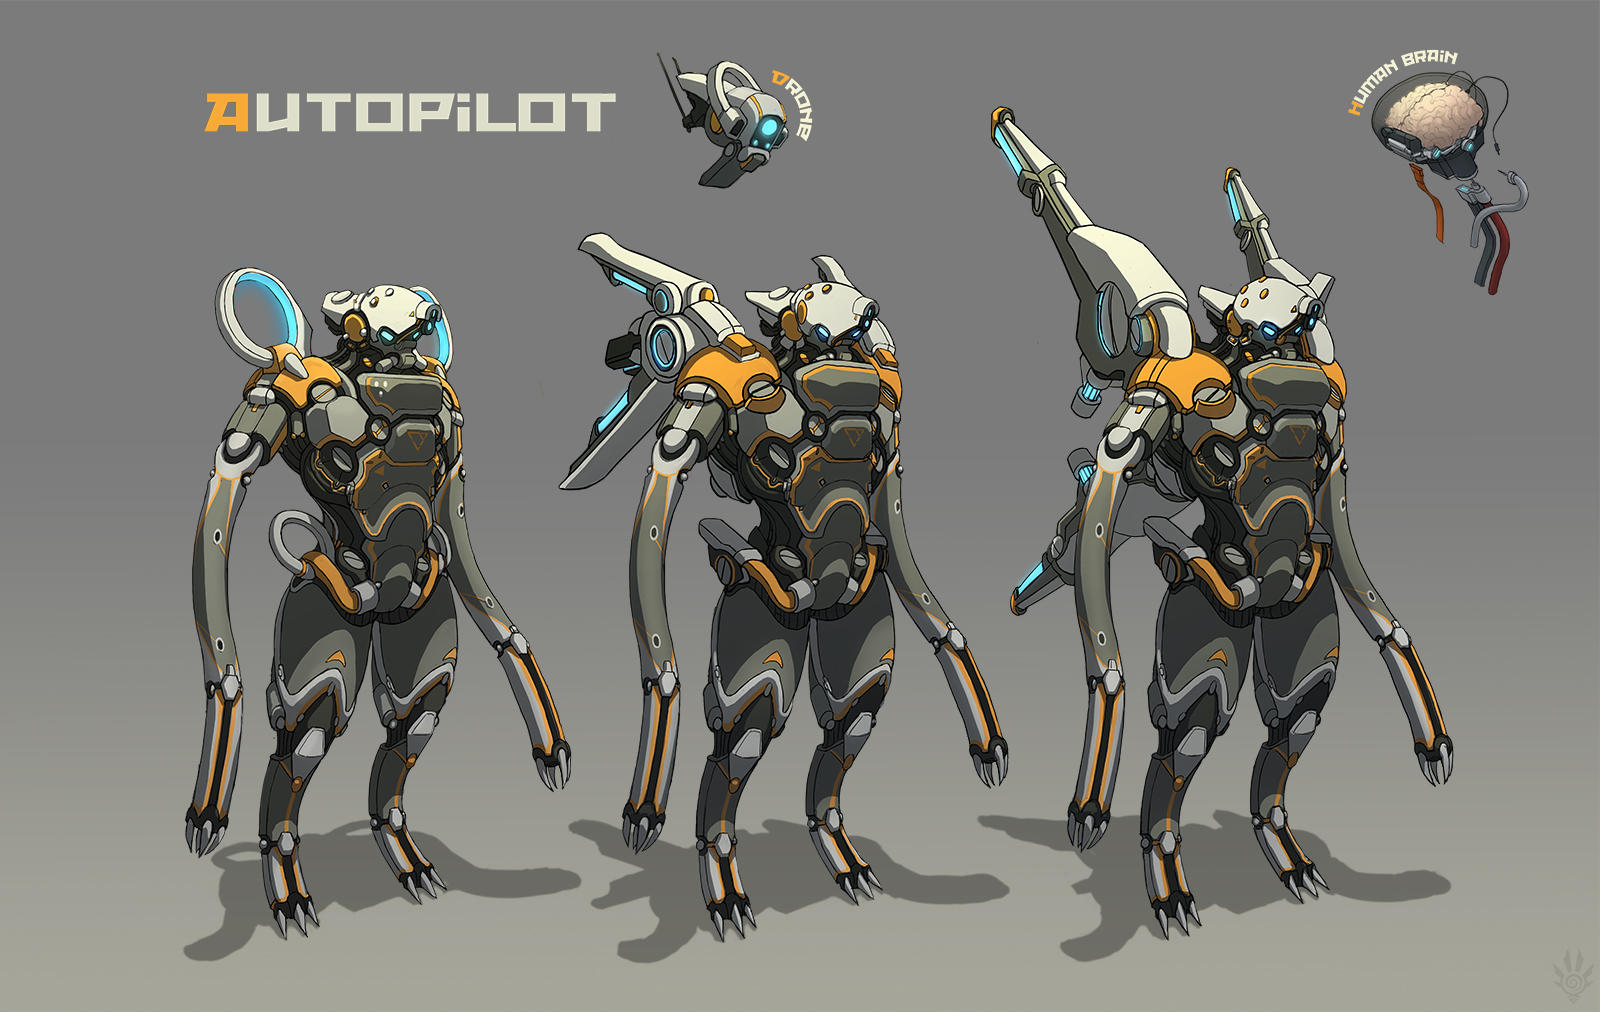 Autopilot by Flip-Fox